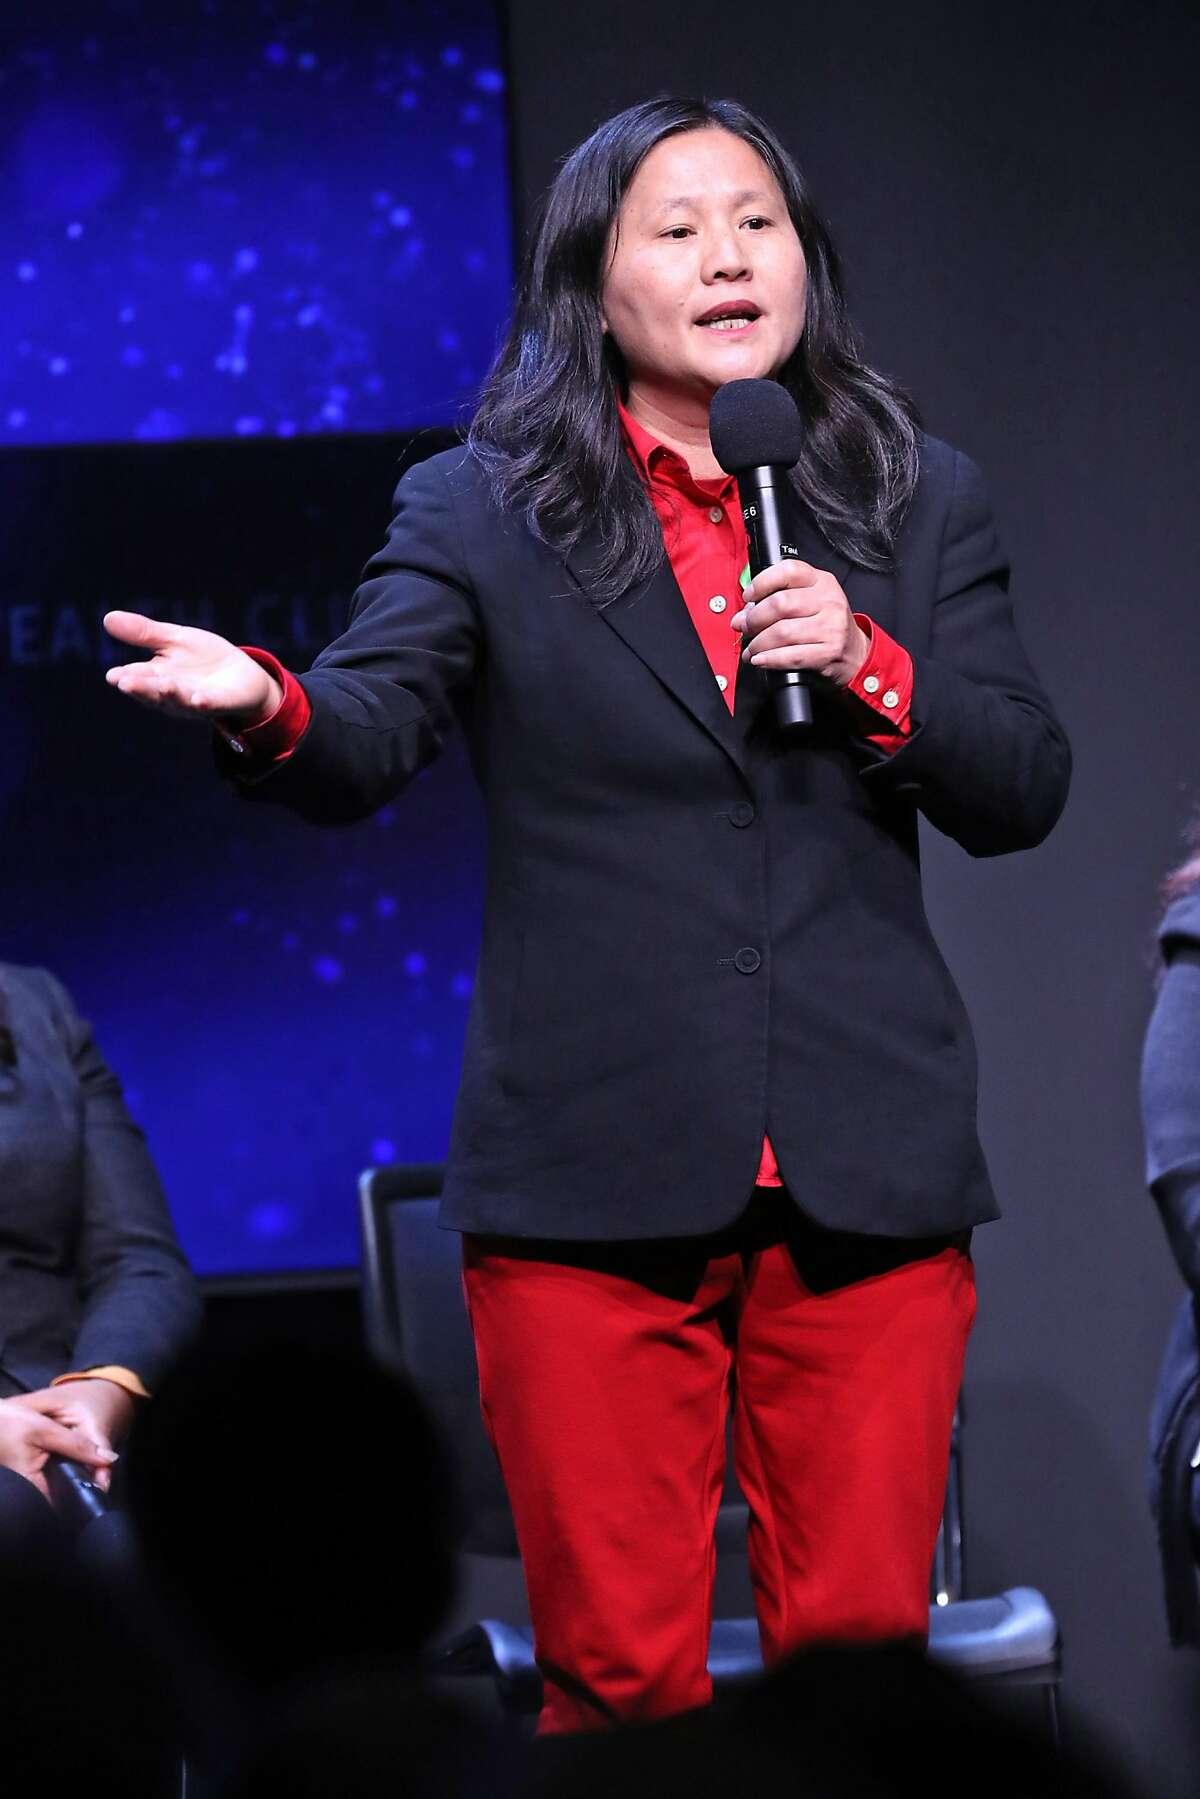 Ellen Lee Zhou during San Francisco mayoral debate at Commonwealth Club in San Francisco, CA on Monday, May 14, 2018.